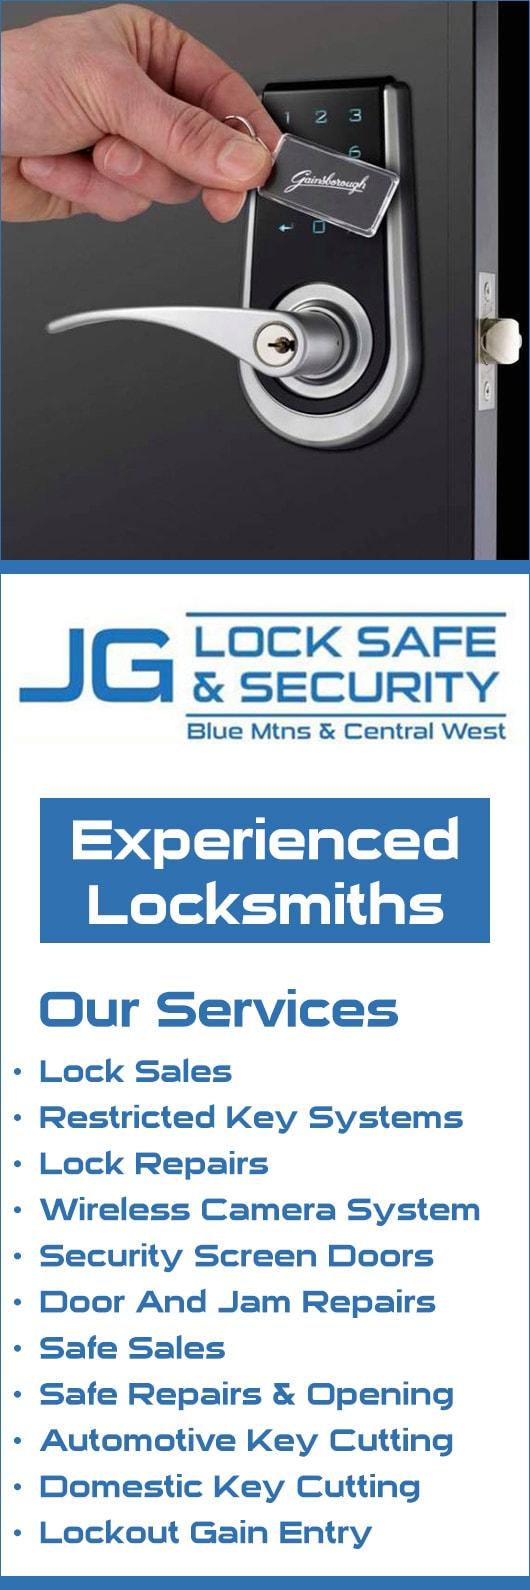 JG Lock Safe & Security - Locksmiths & Locksmith Services